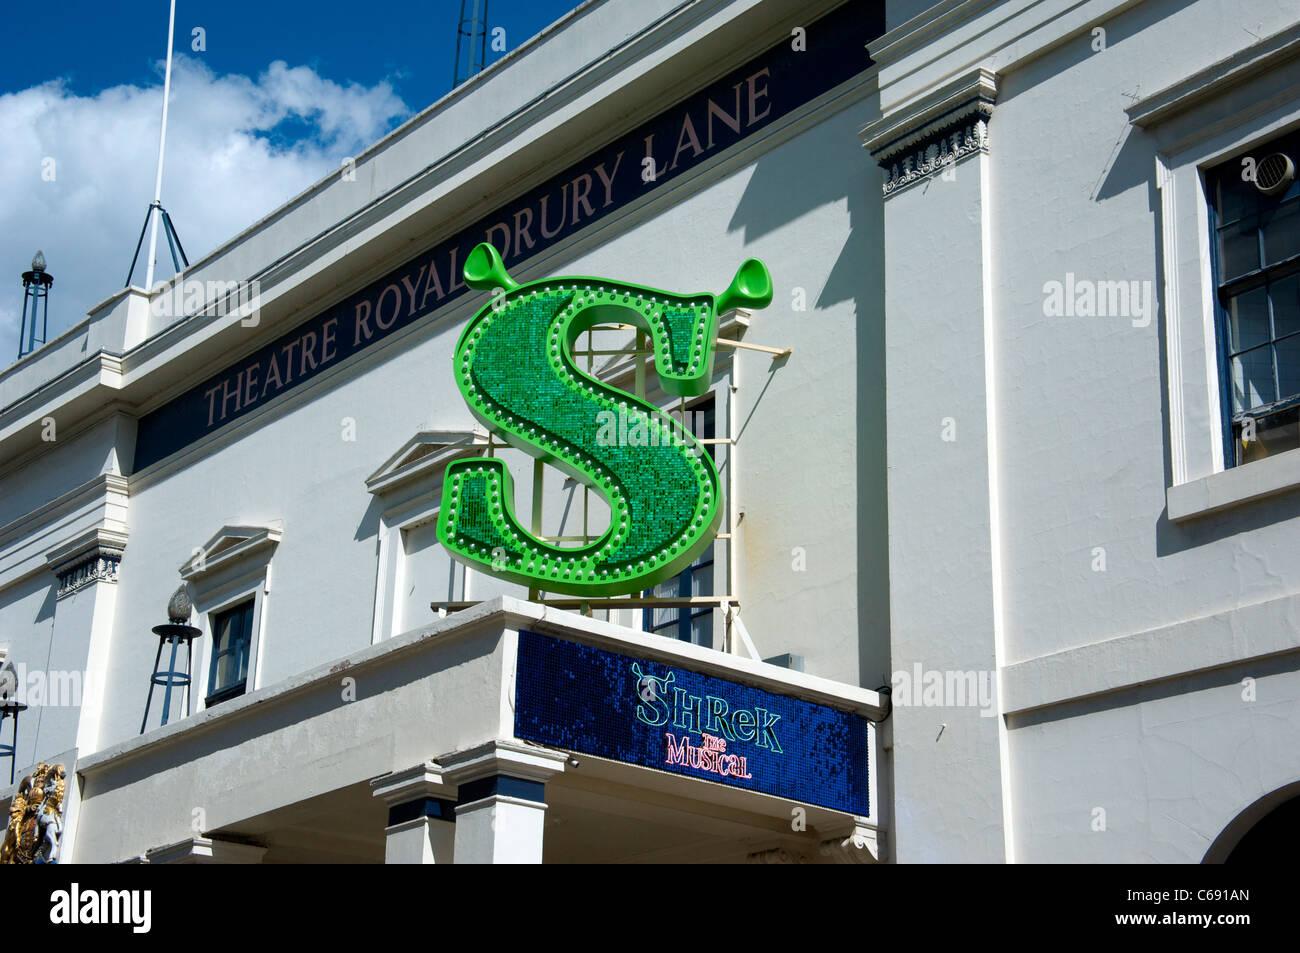 Shrek the Musical at London's Theatre Royal, Drury Lane - Stock Image